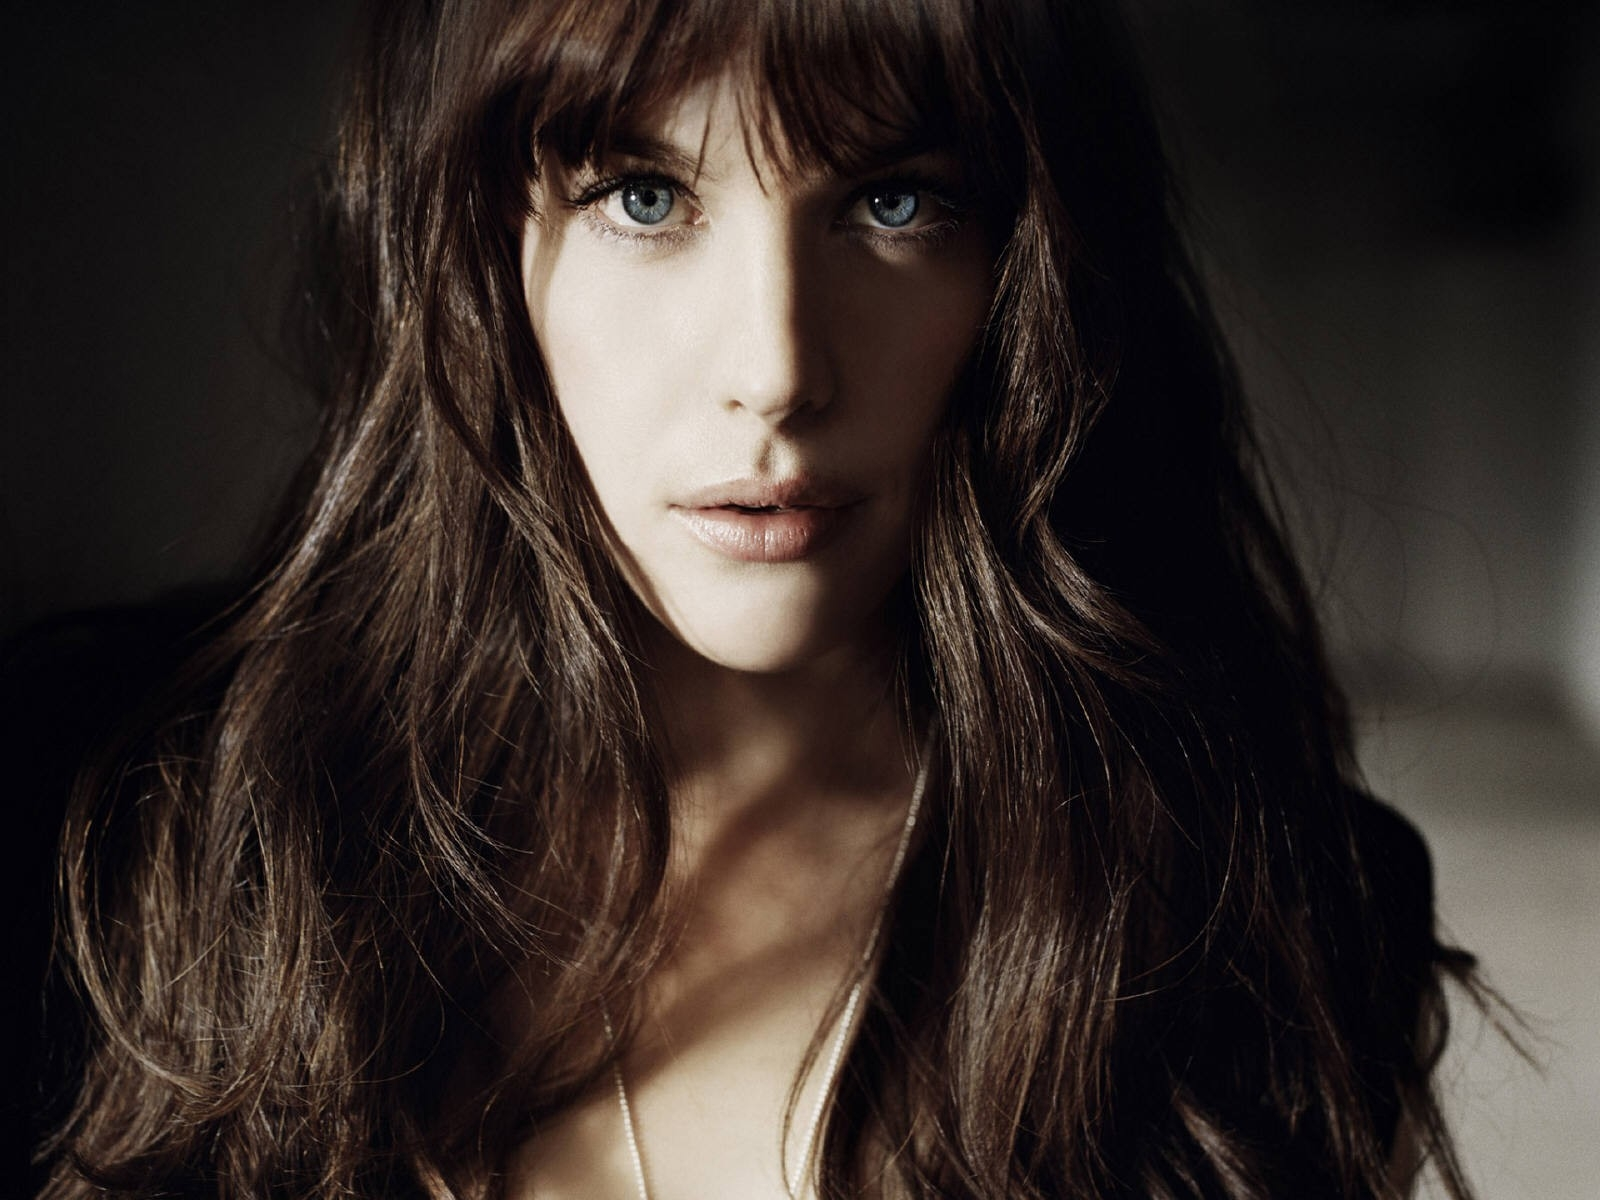 Wallpaper - luce e ombra per Liv Tyler